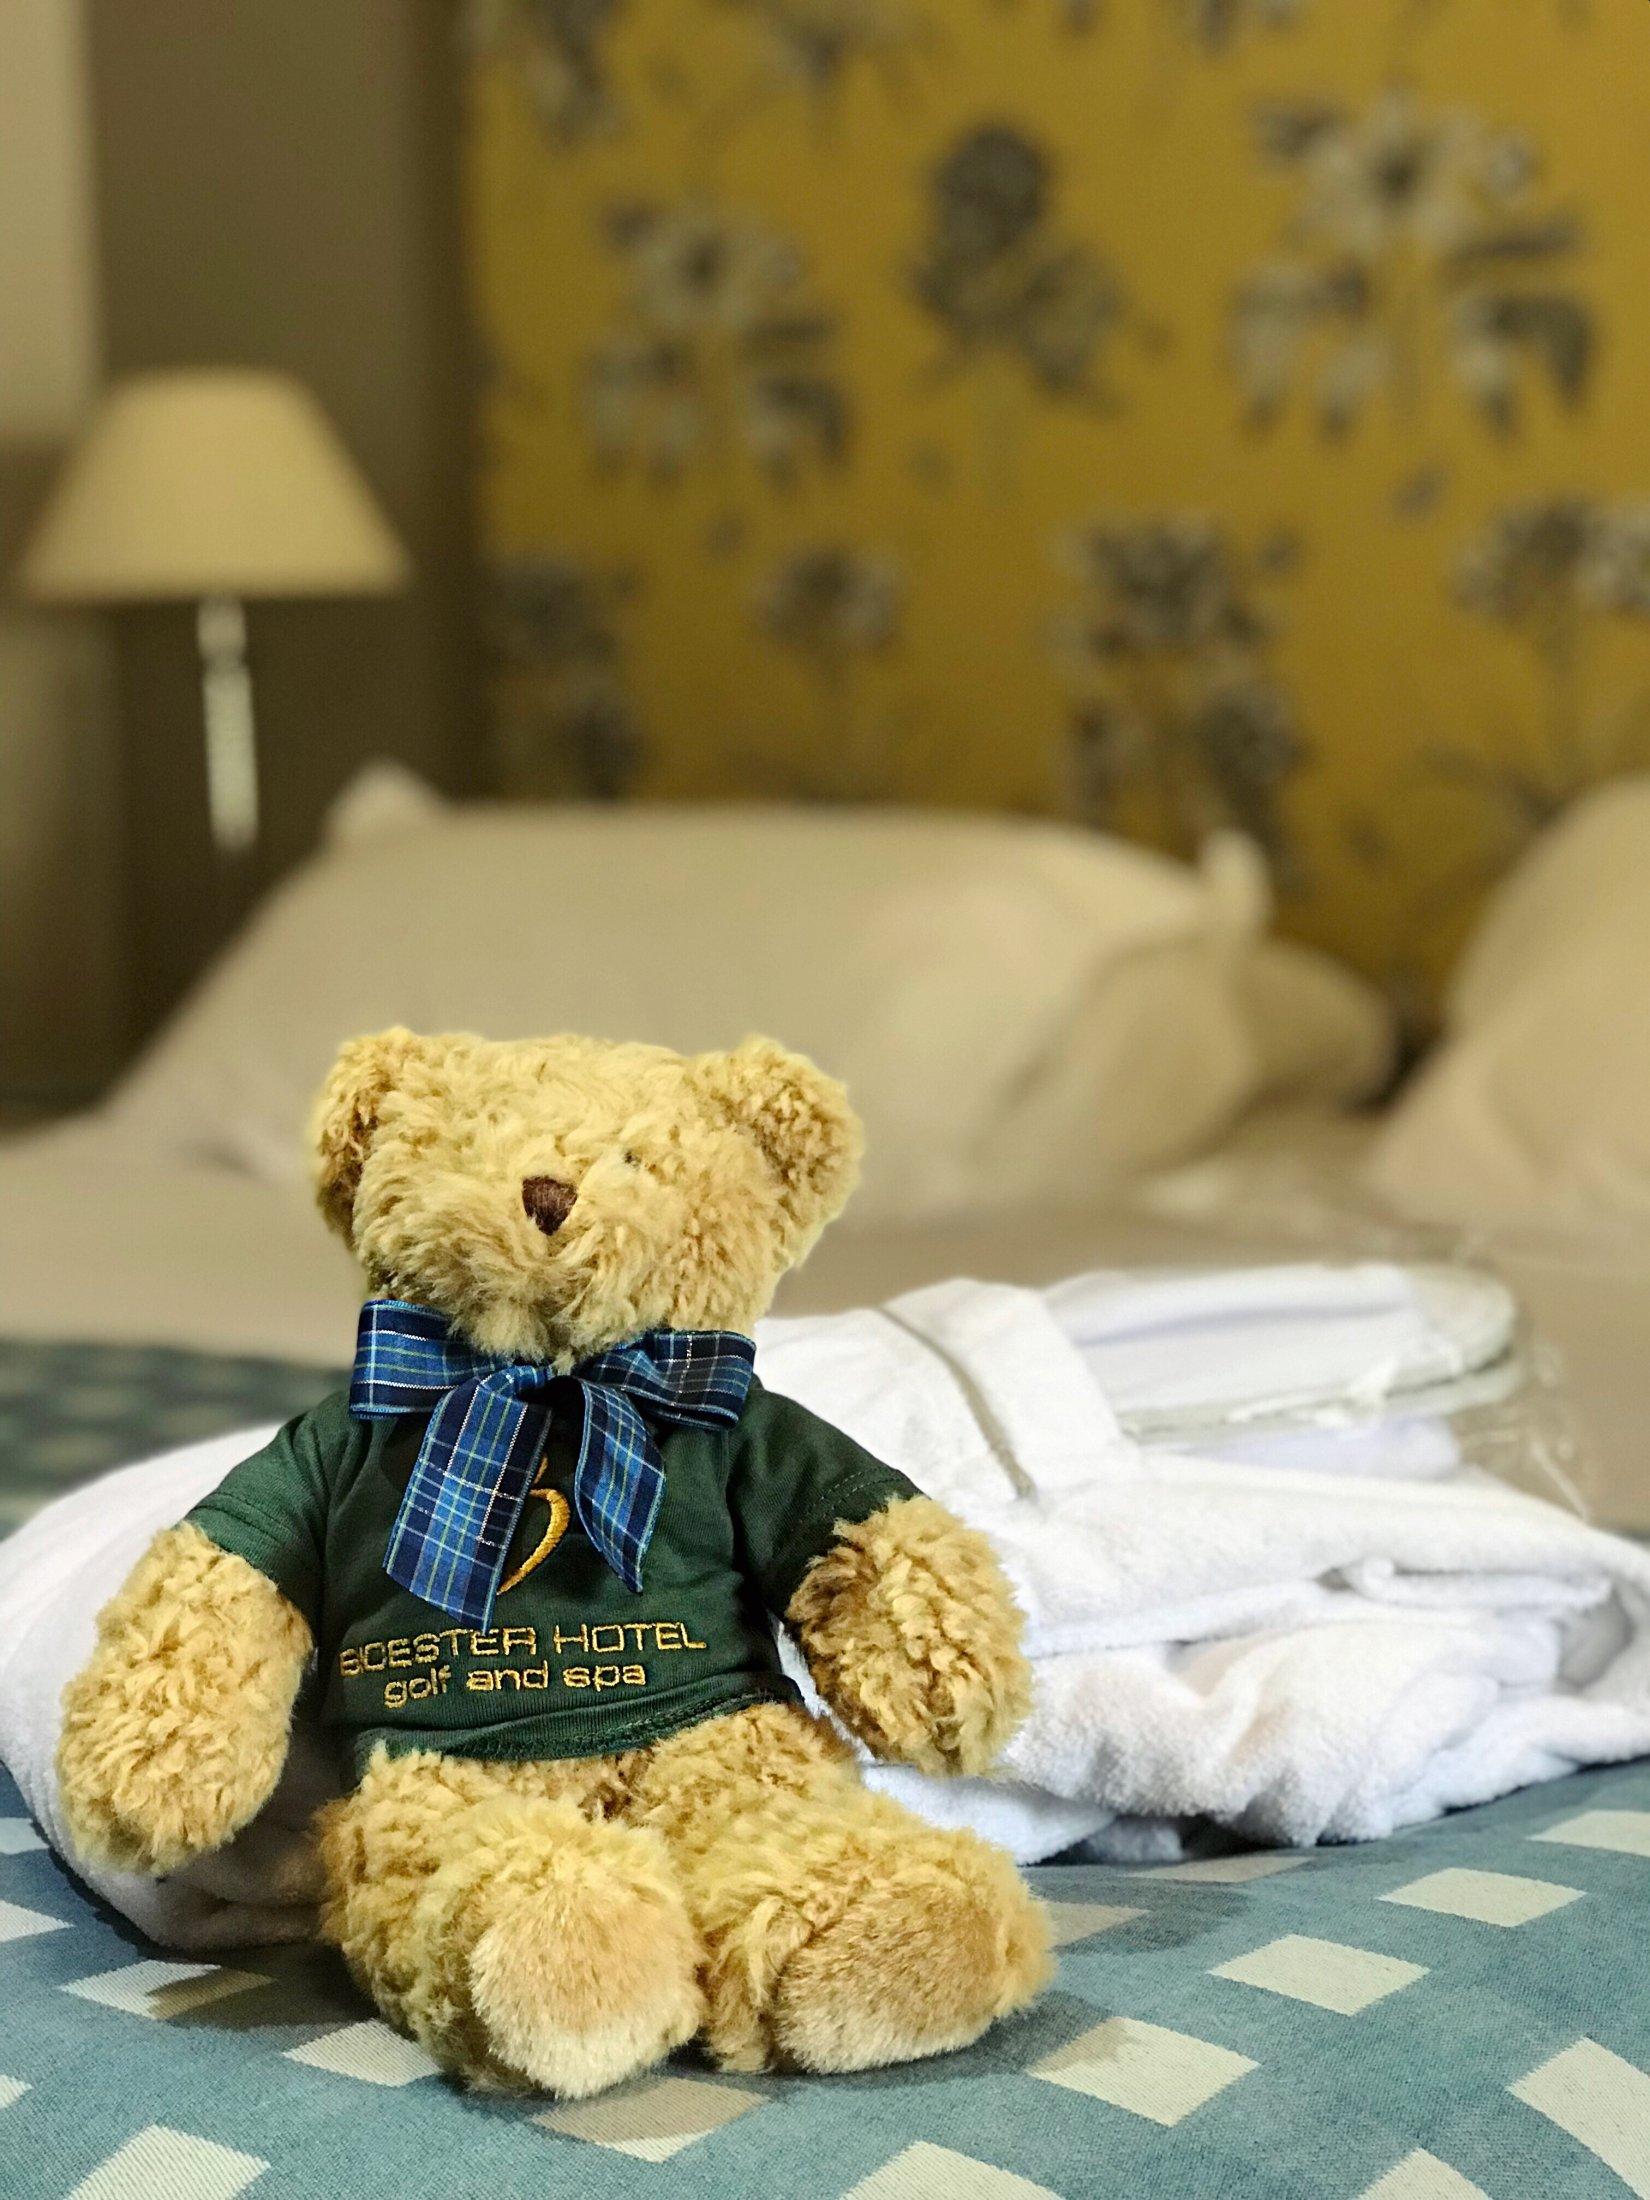 Teddy bear bicester bear, Mr B